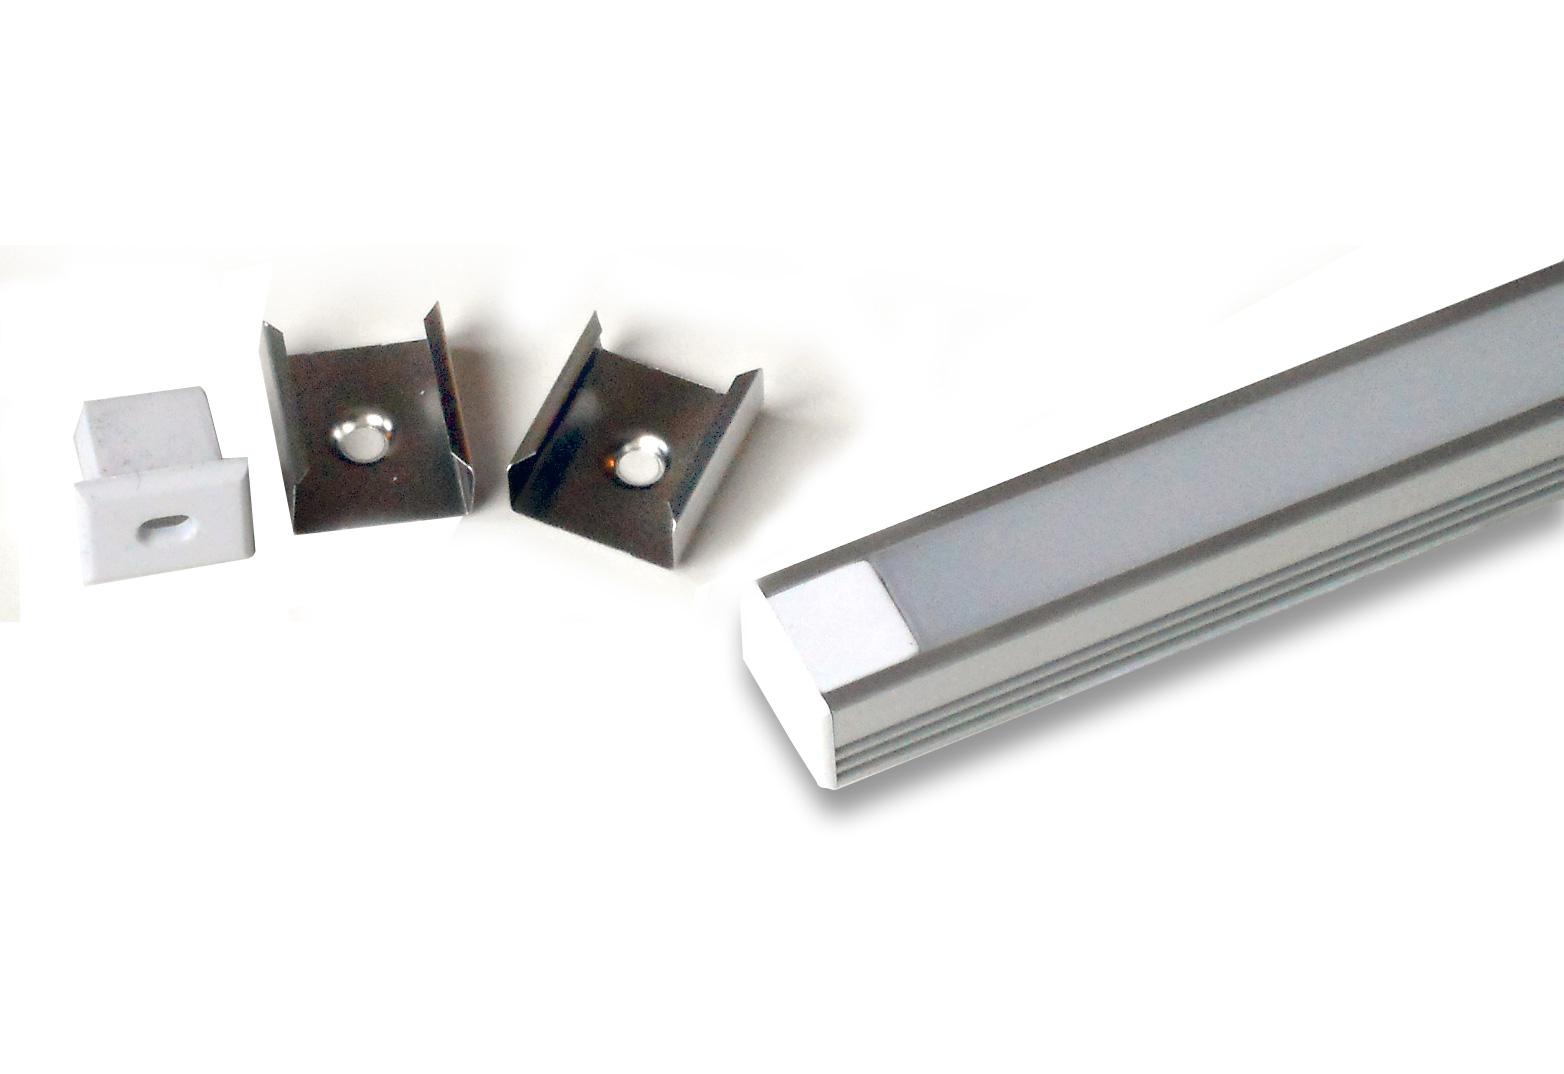 Aluminum Channel For Flexible Strip Surface Mount